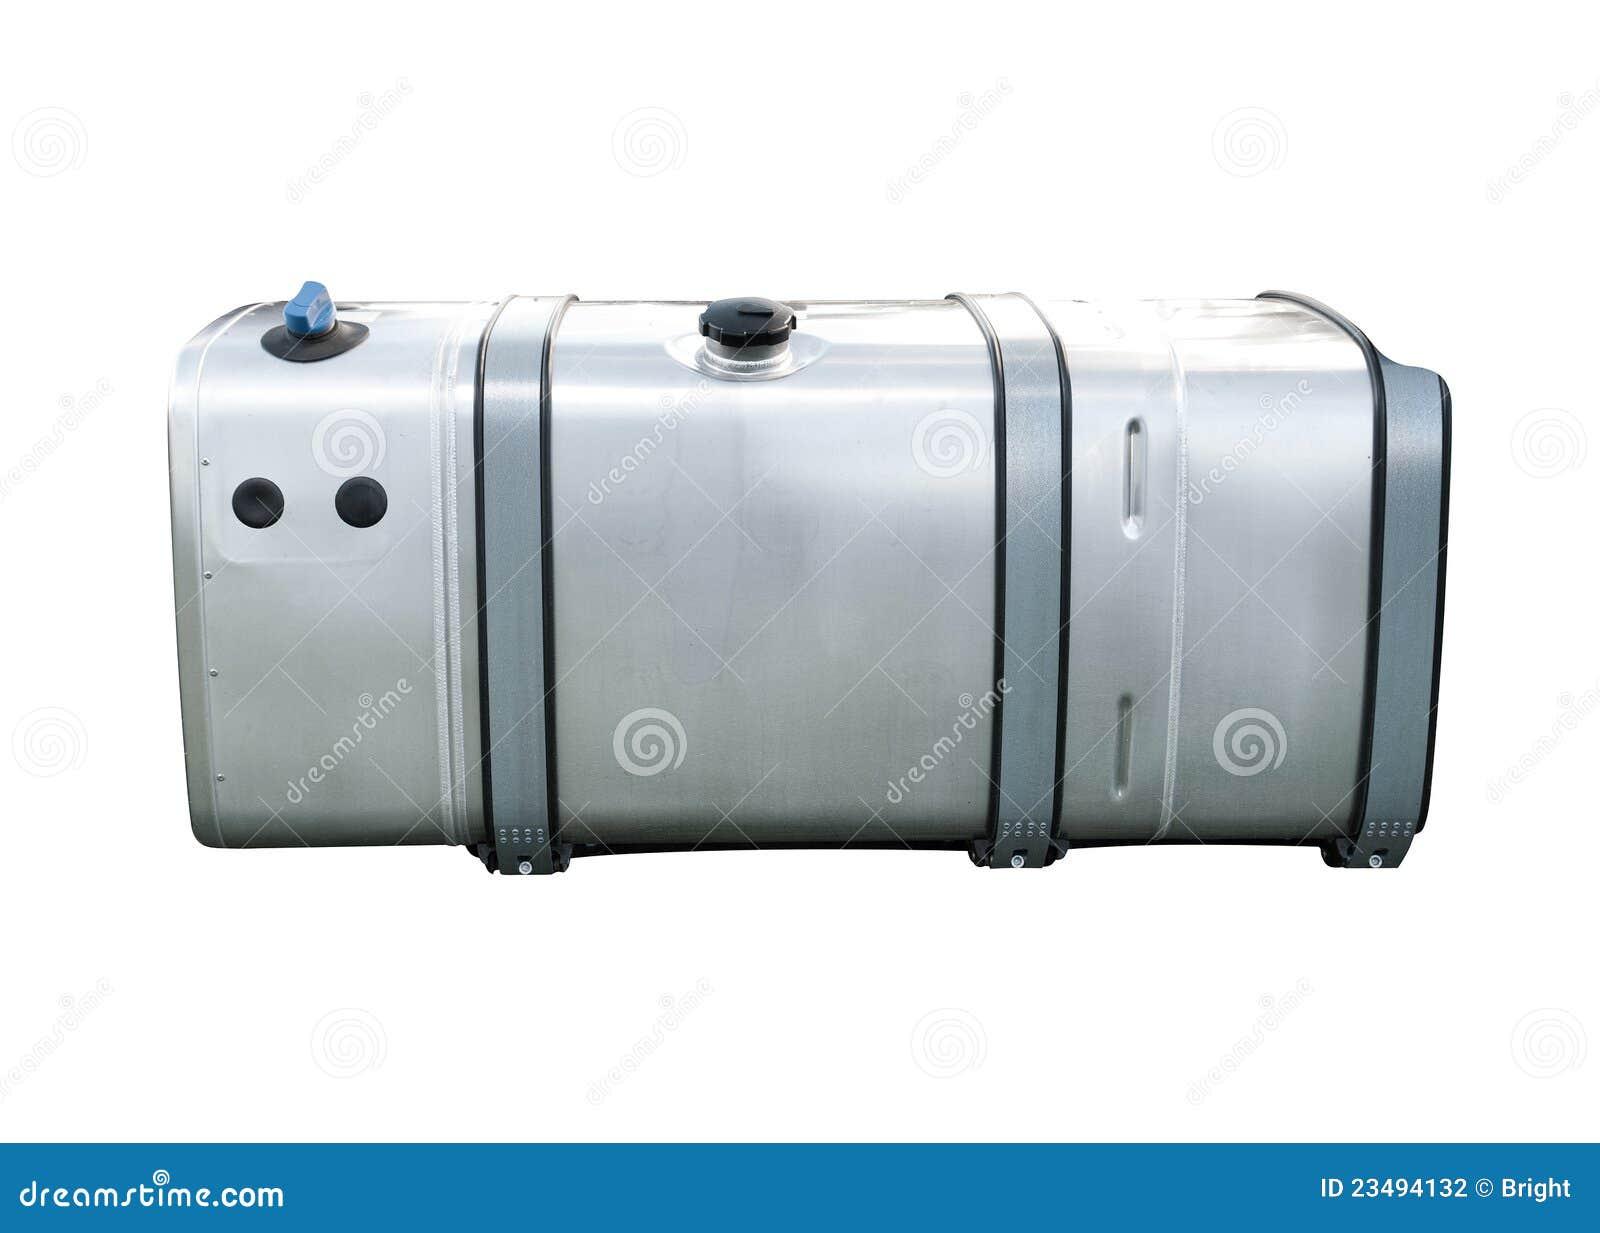 truck fuel tank stock photography image 23494132. Black Bedroom Furniture Sets. Home Design Ideas